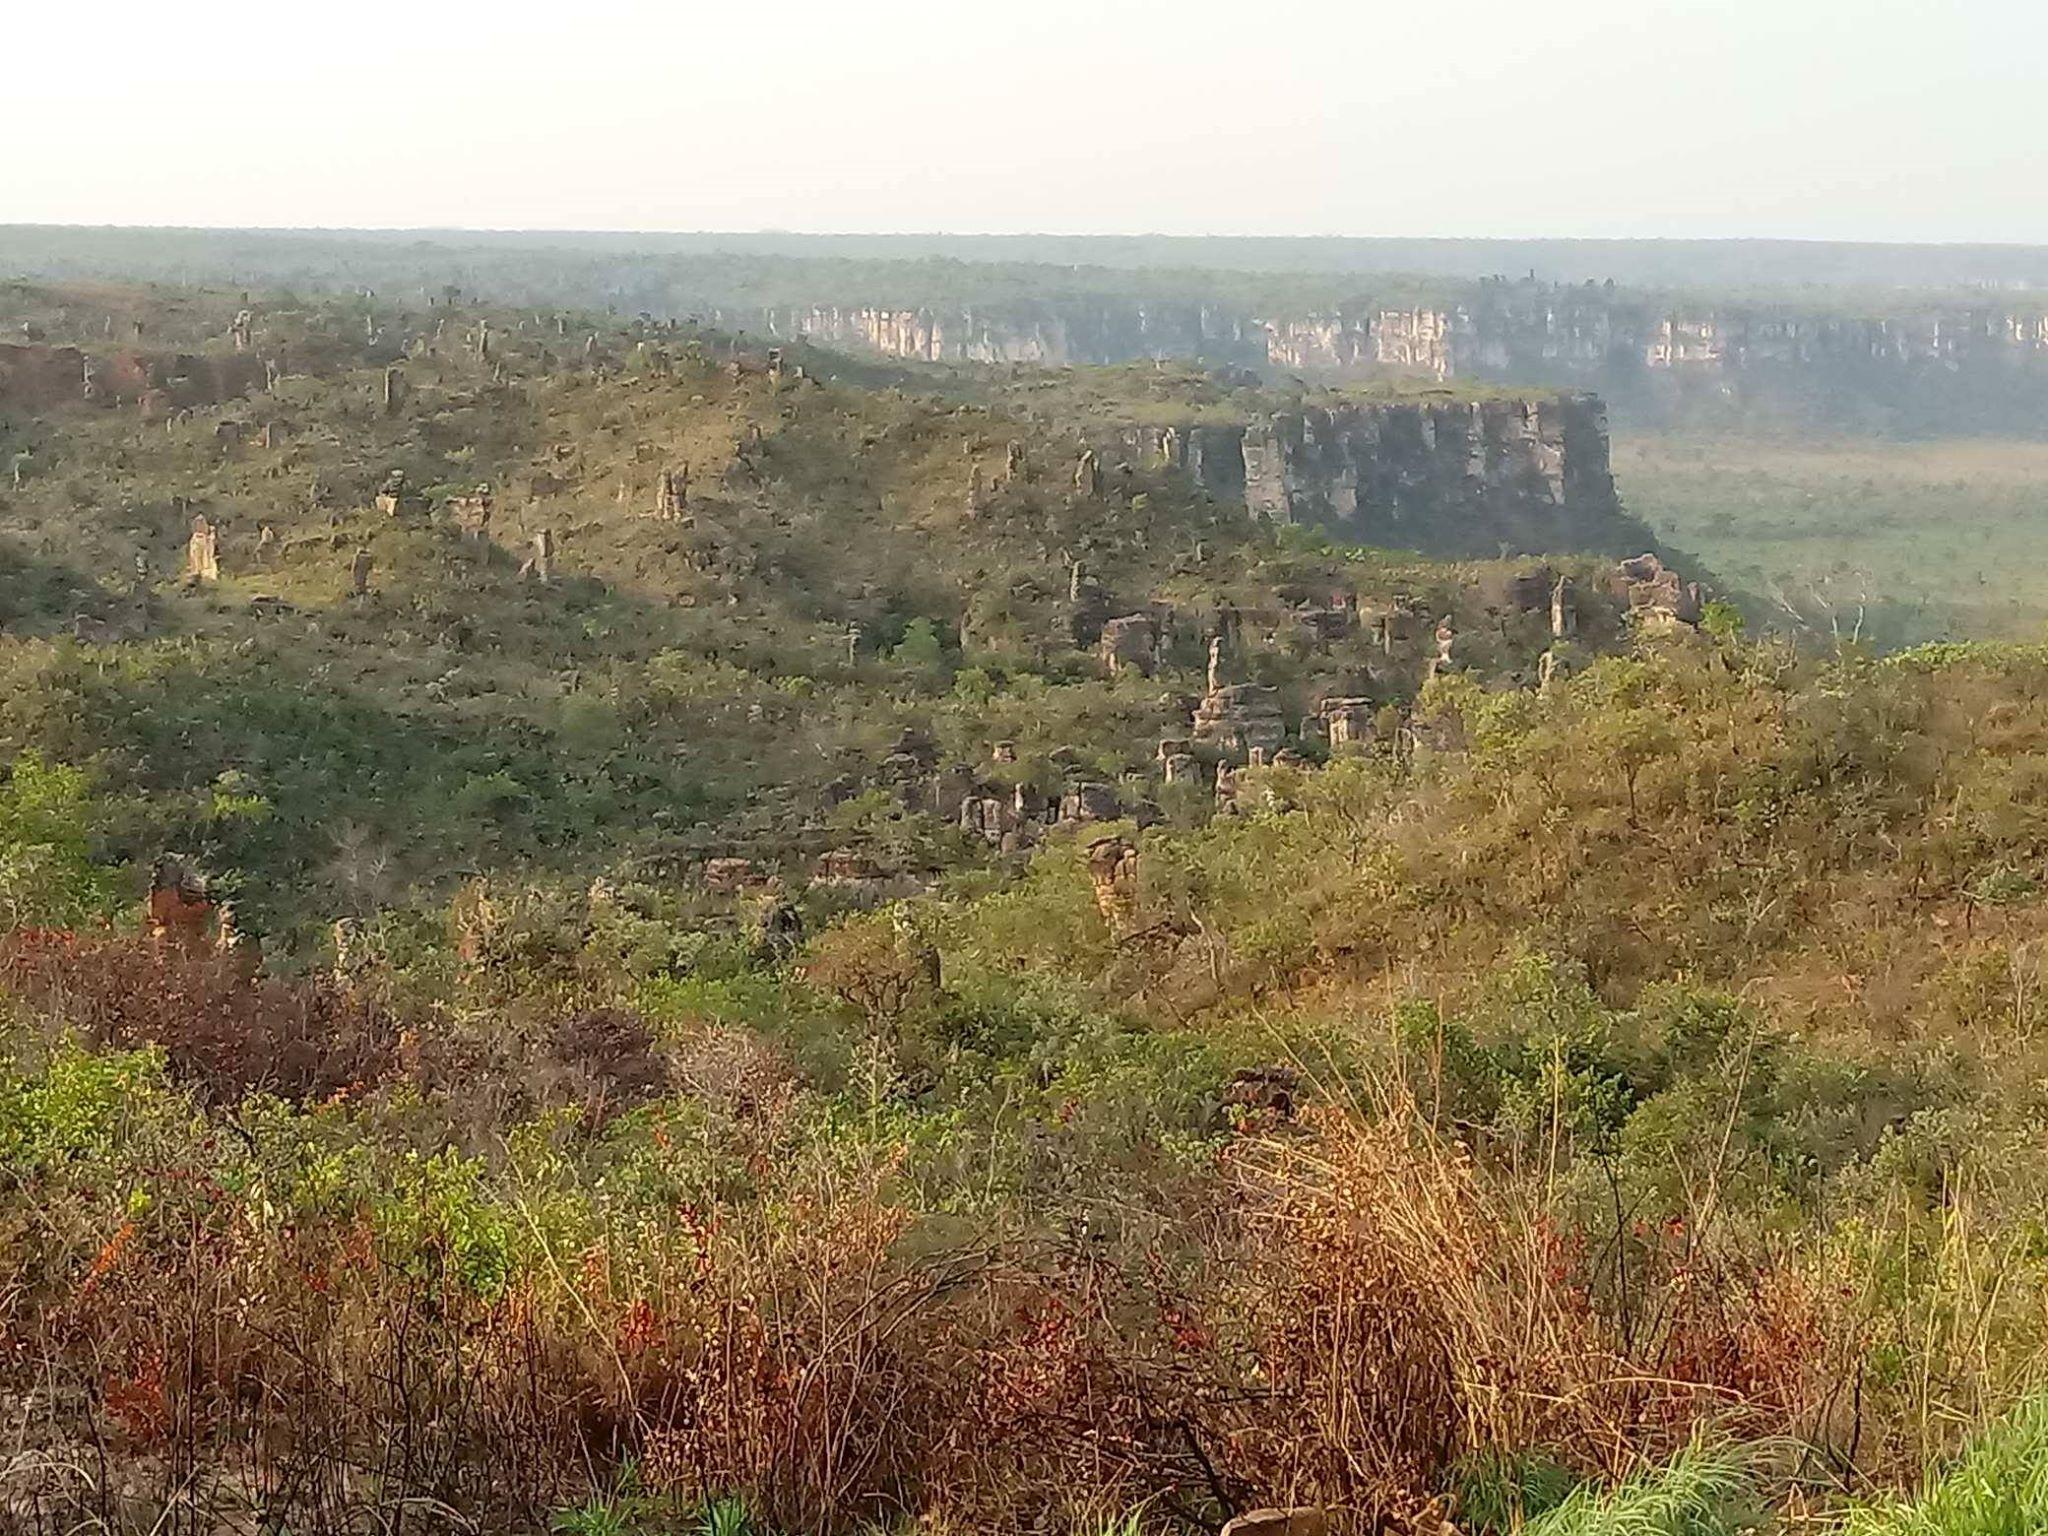 28-9-2018-Caynion-Jalapao-National-park-17[1]